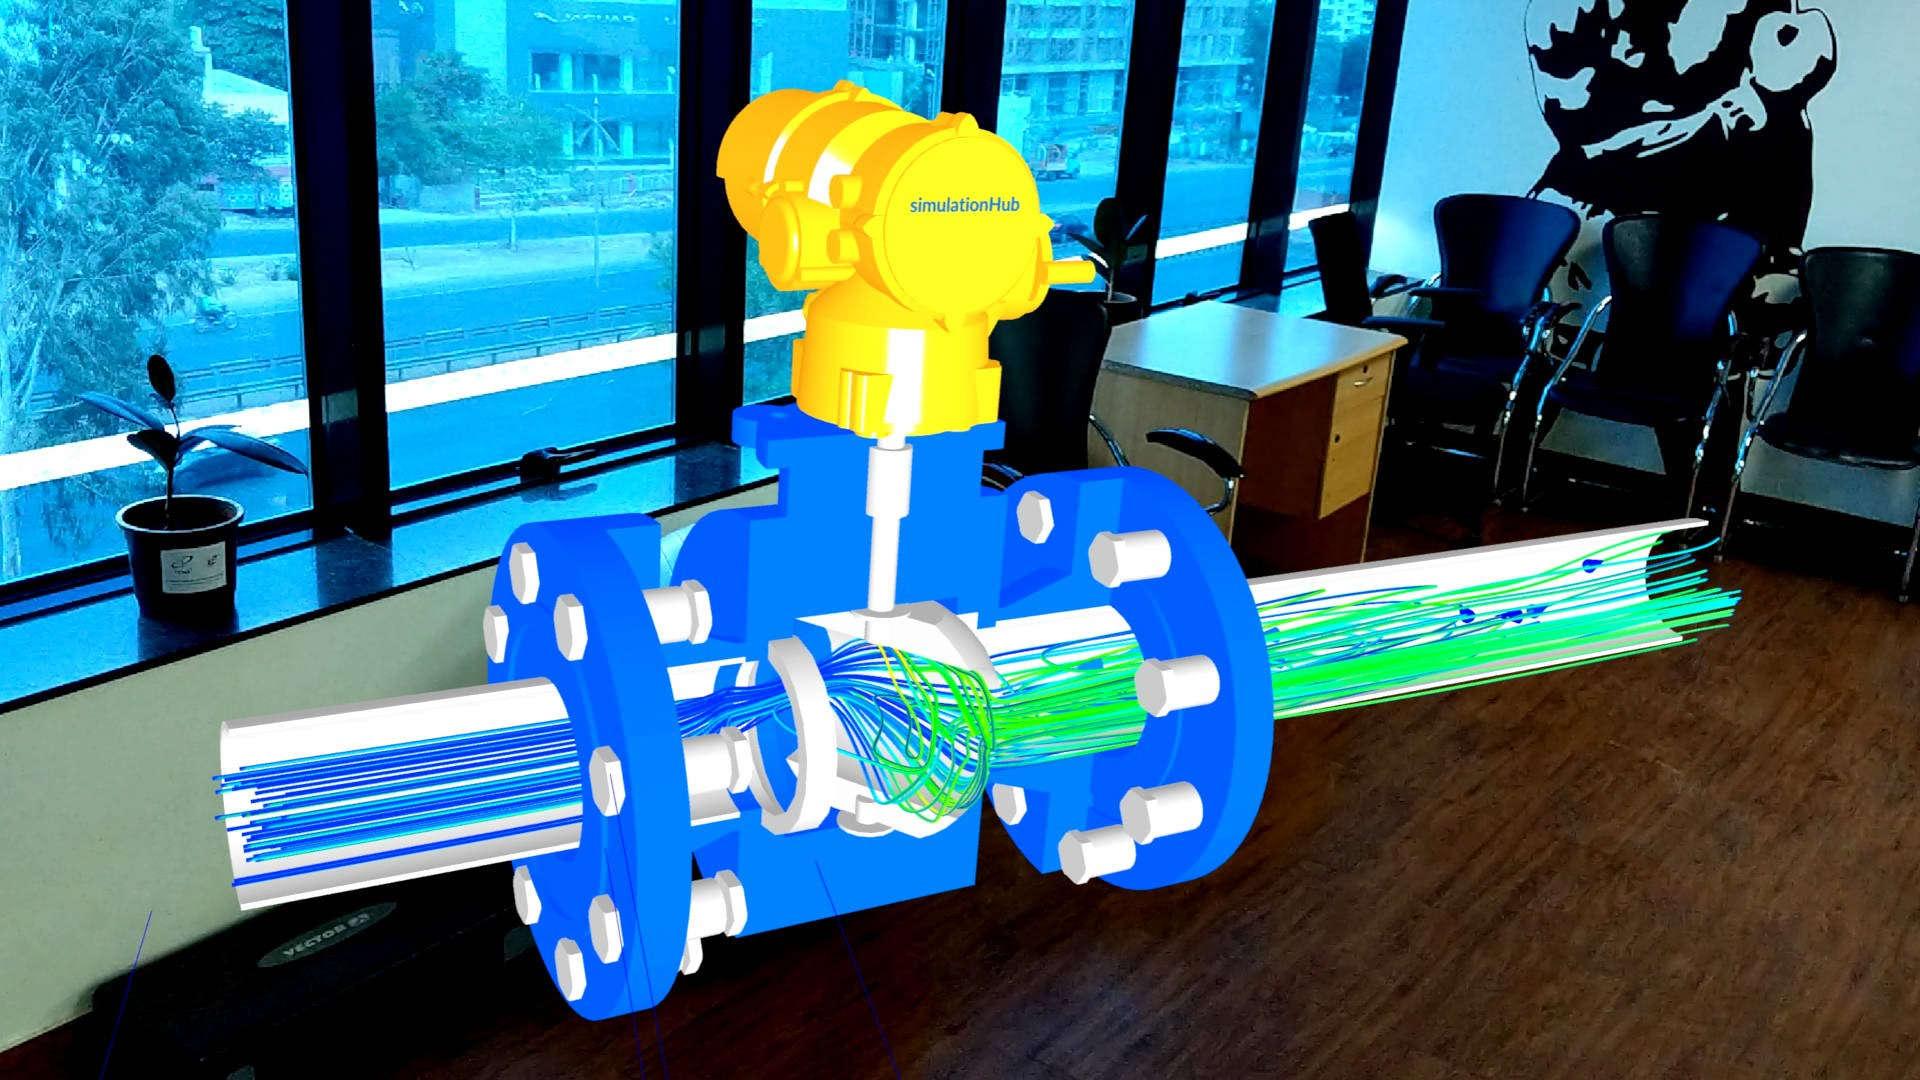 simulationHub's valve Augmented Reality (AR) application